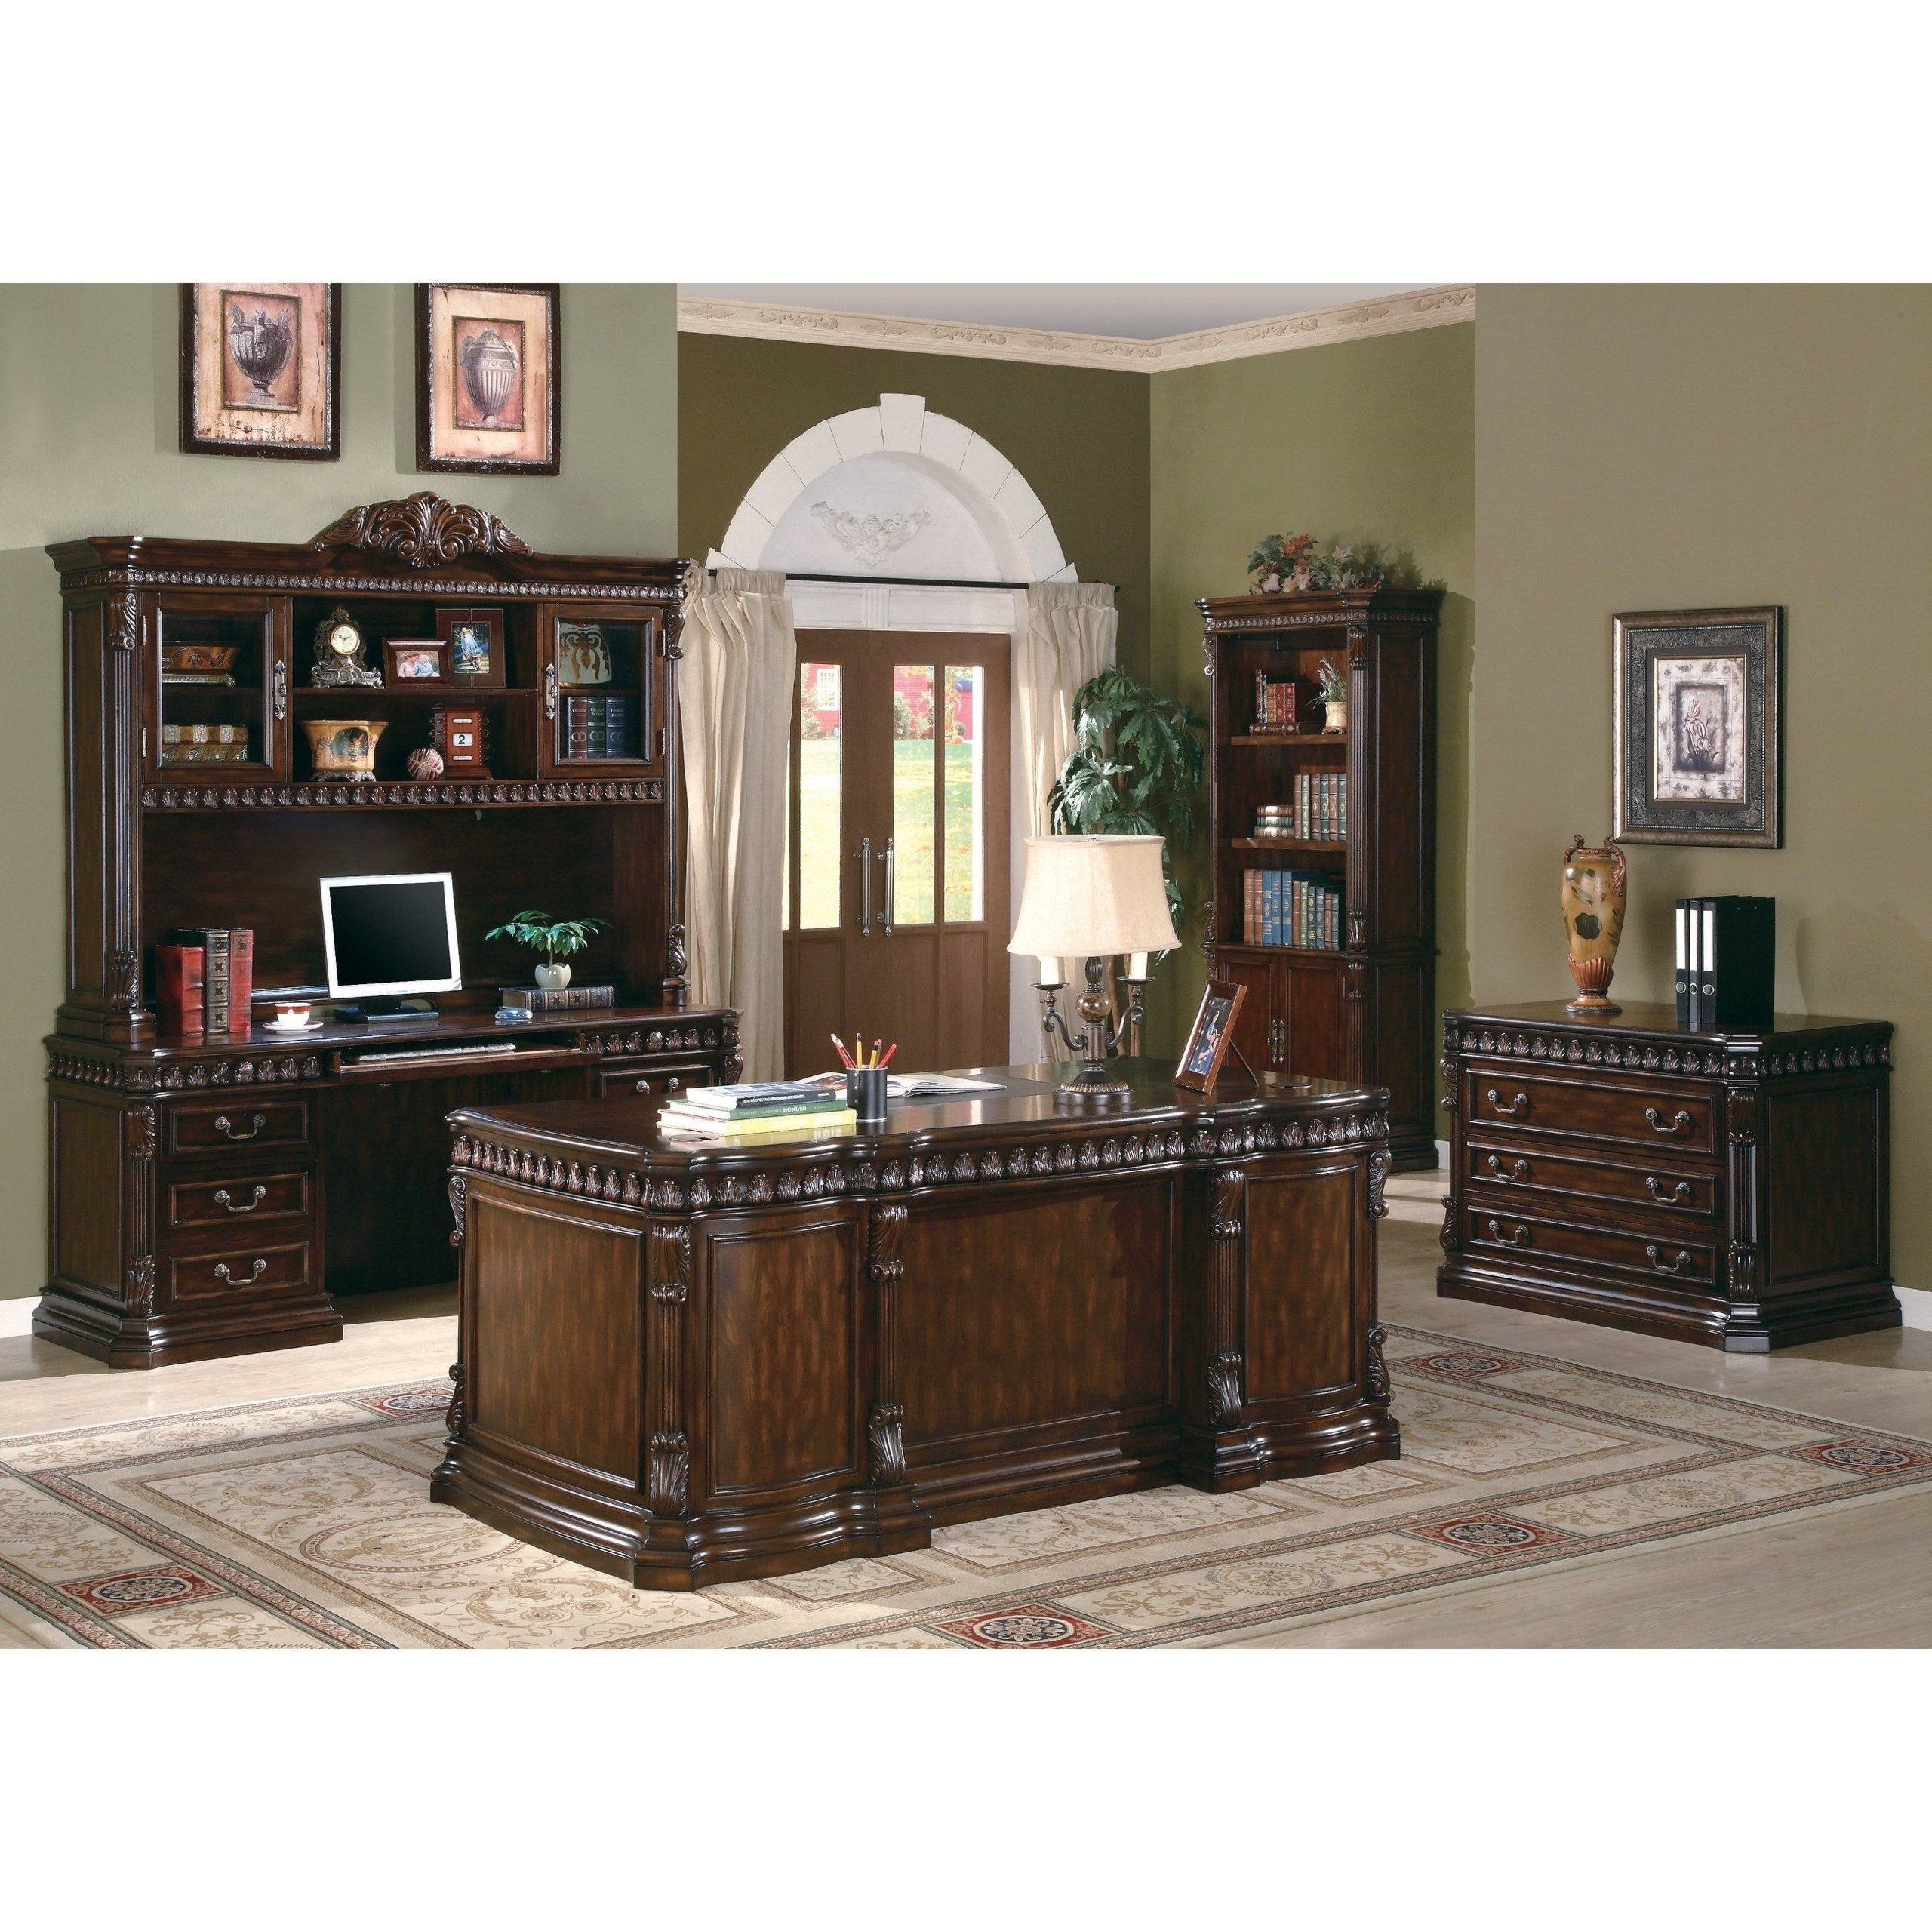 WINDSOR Brown Large Computer Home Executive Study Office Corner Desk Cupboard